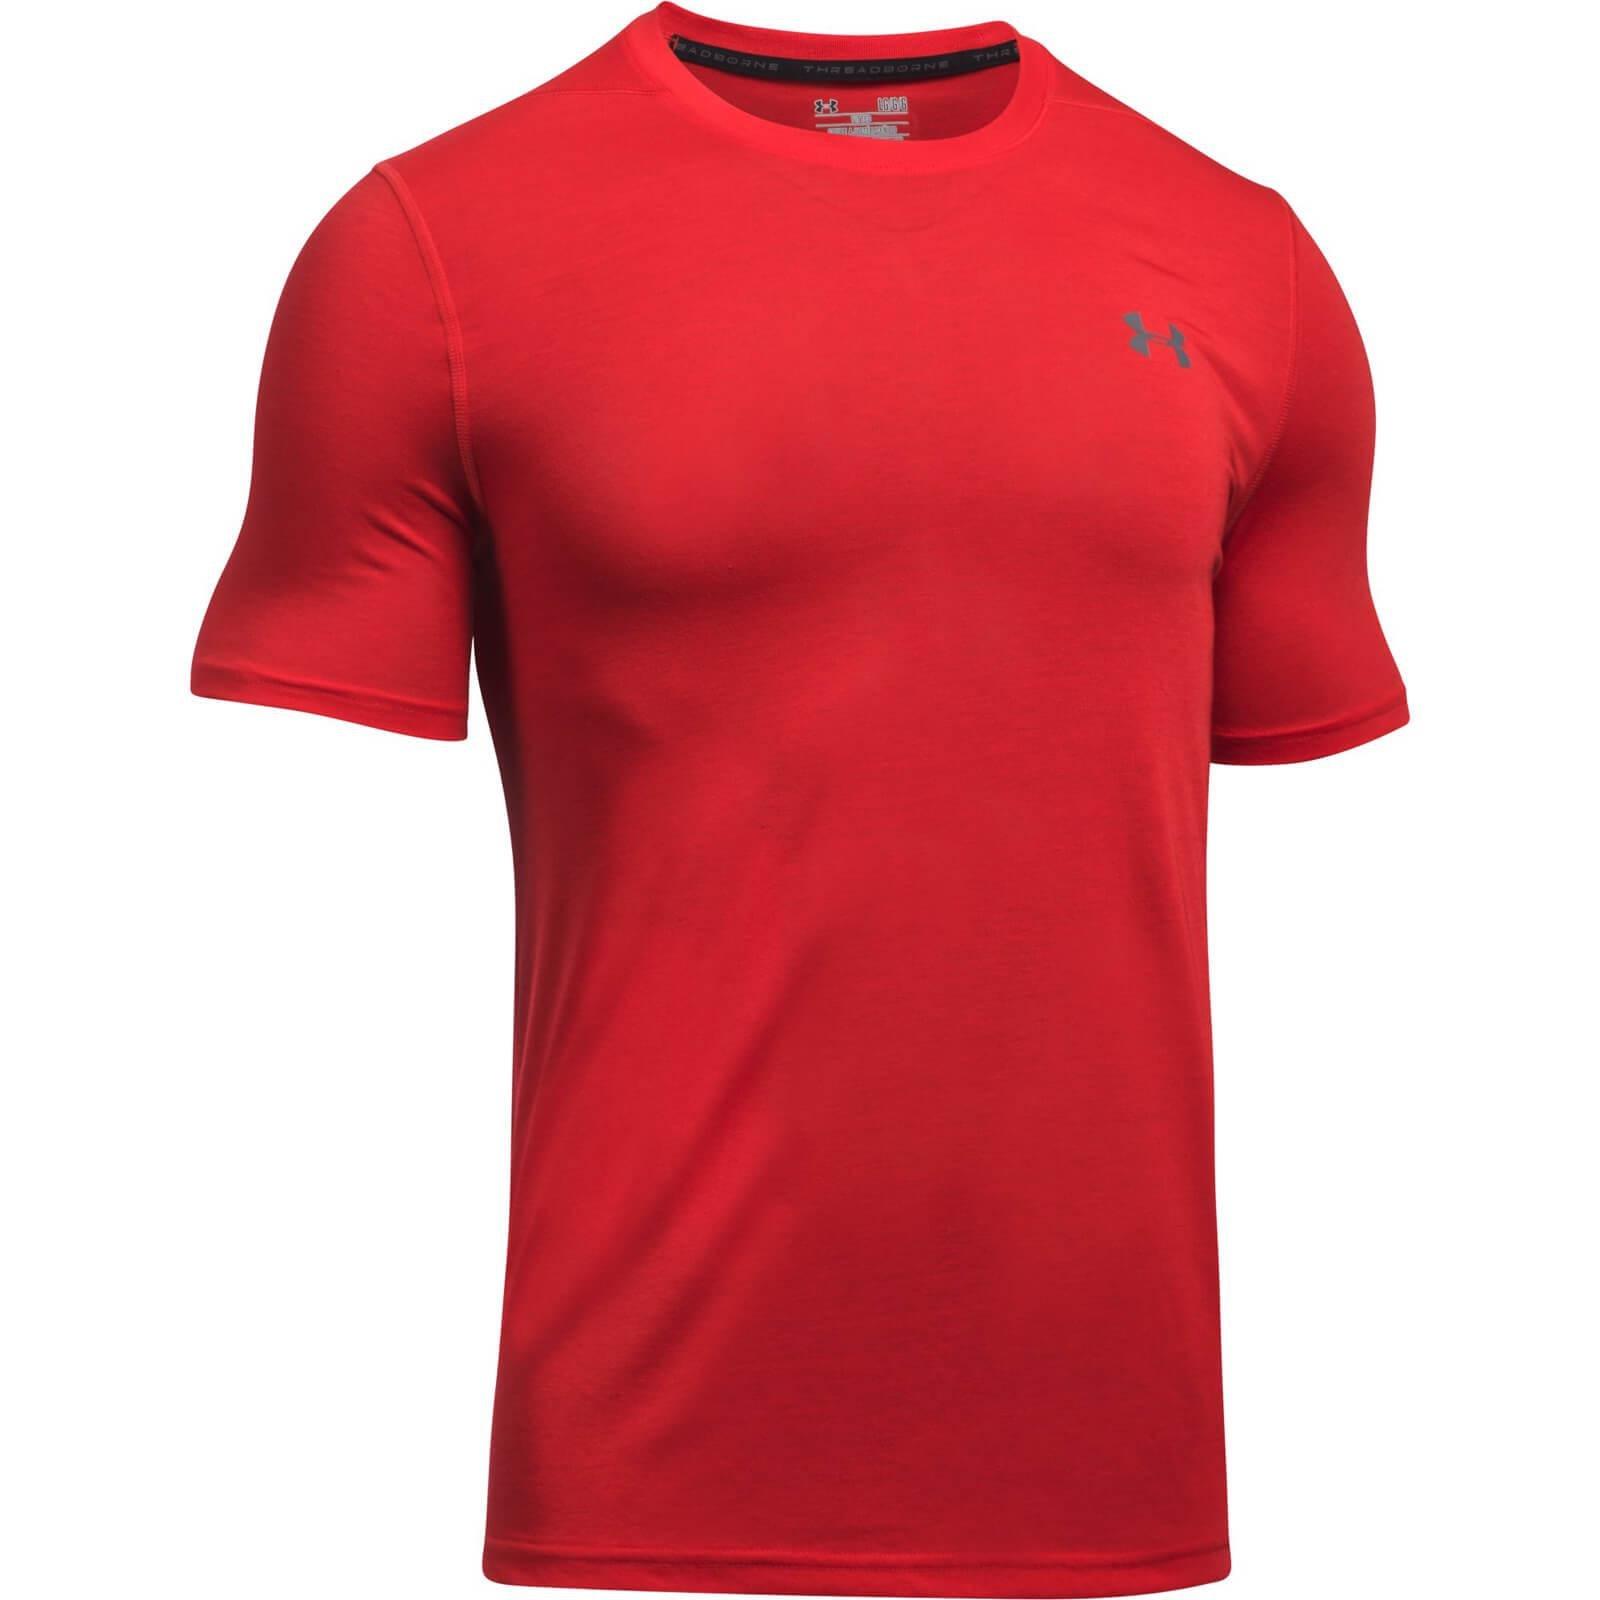 Lyst under armour threadborne fitted t shirt in red for men for Under armour fitted t shirt